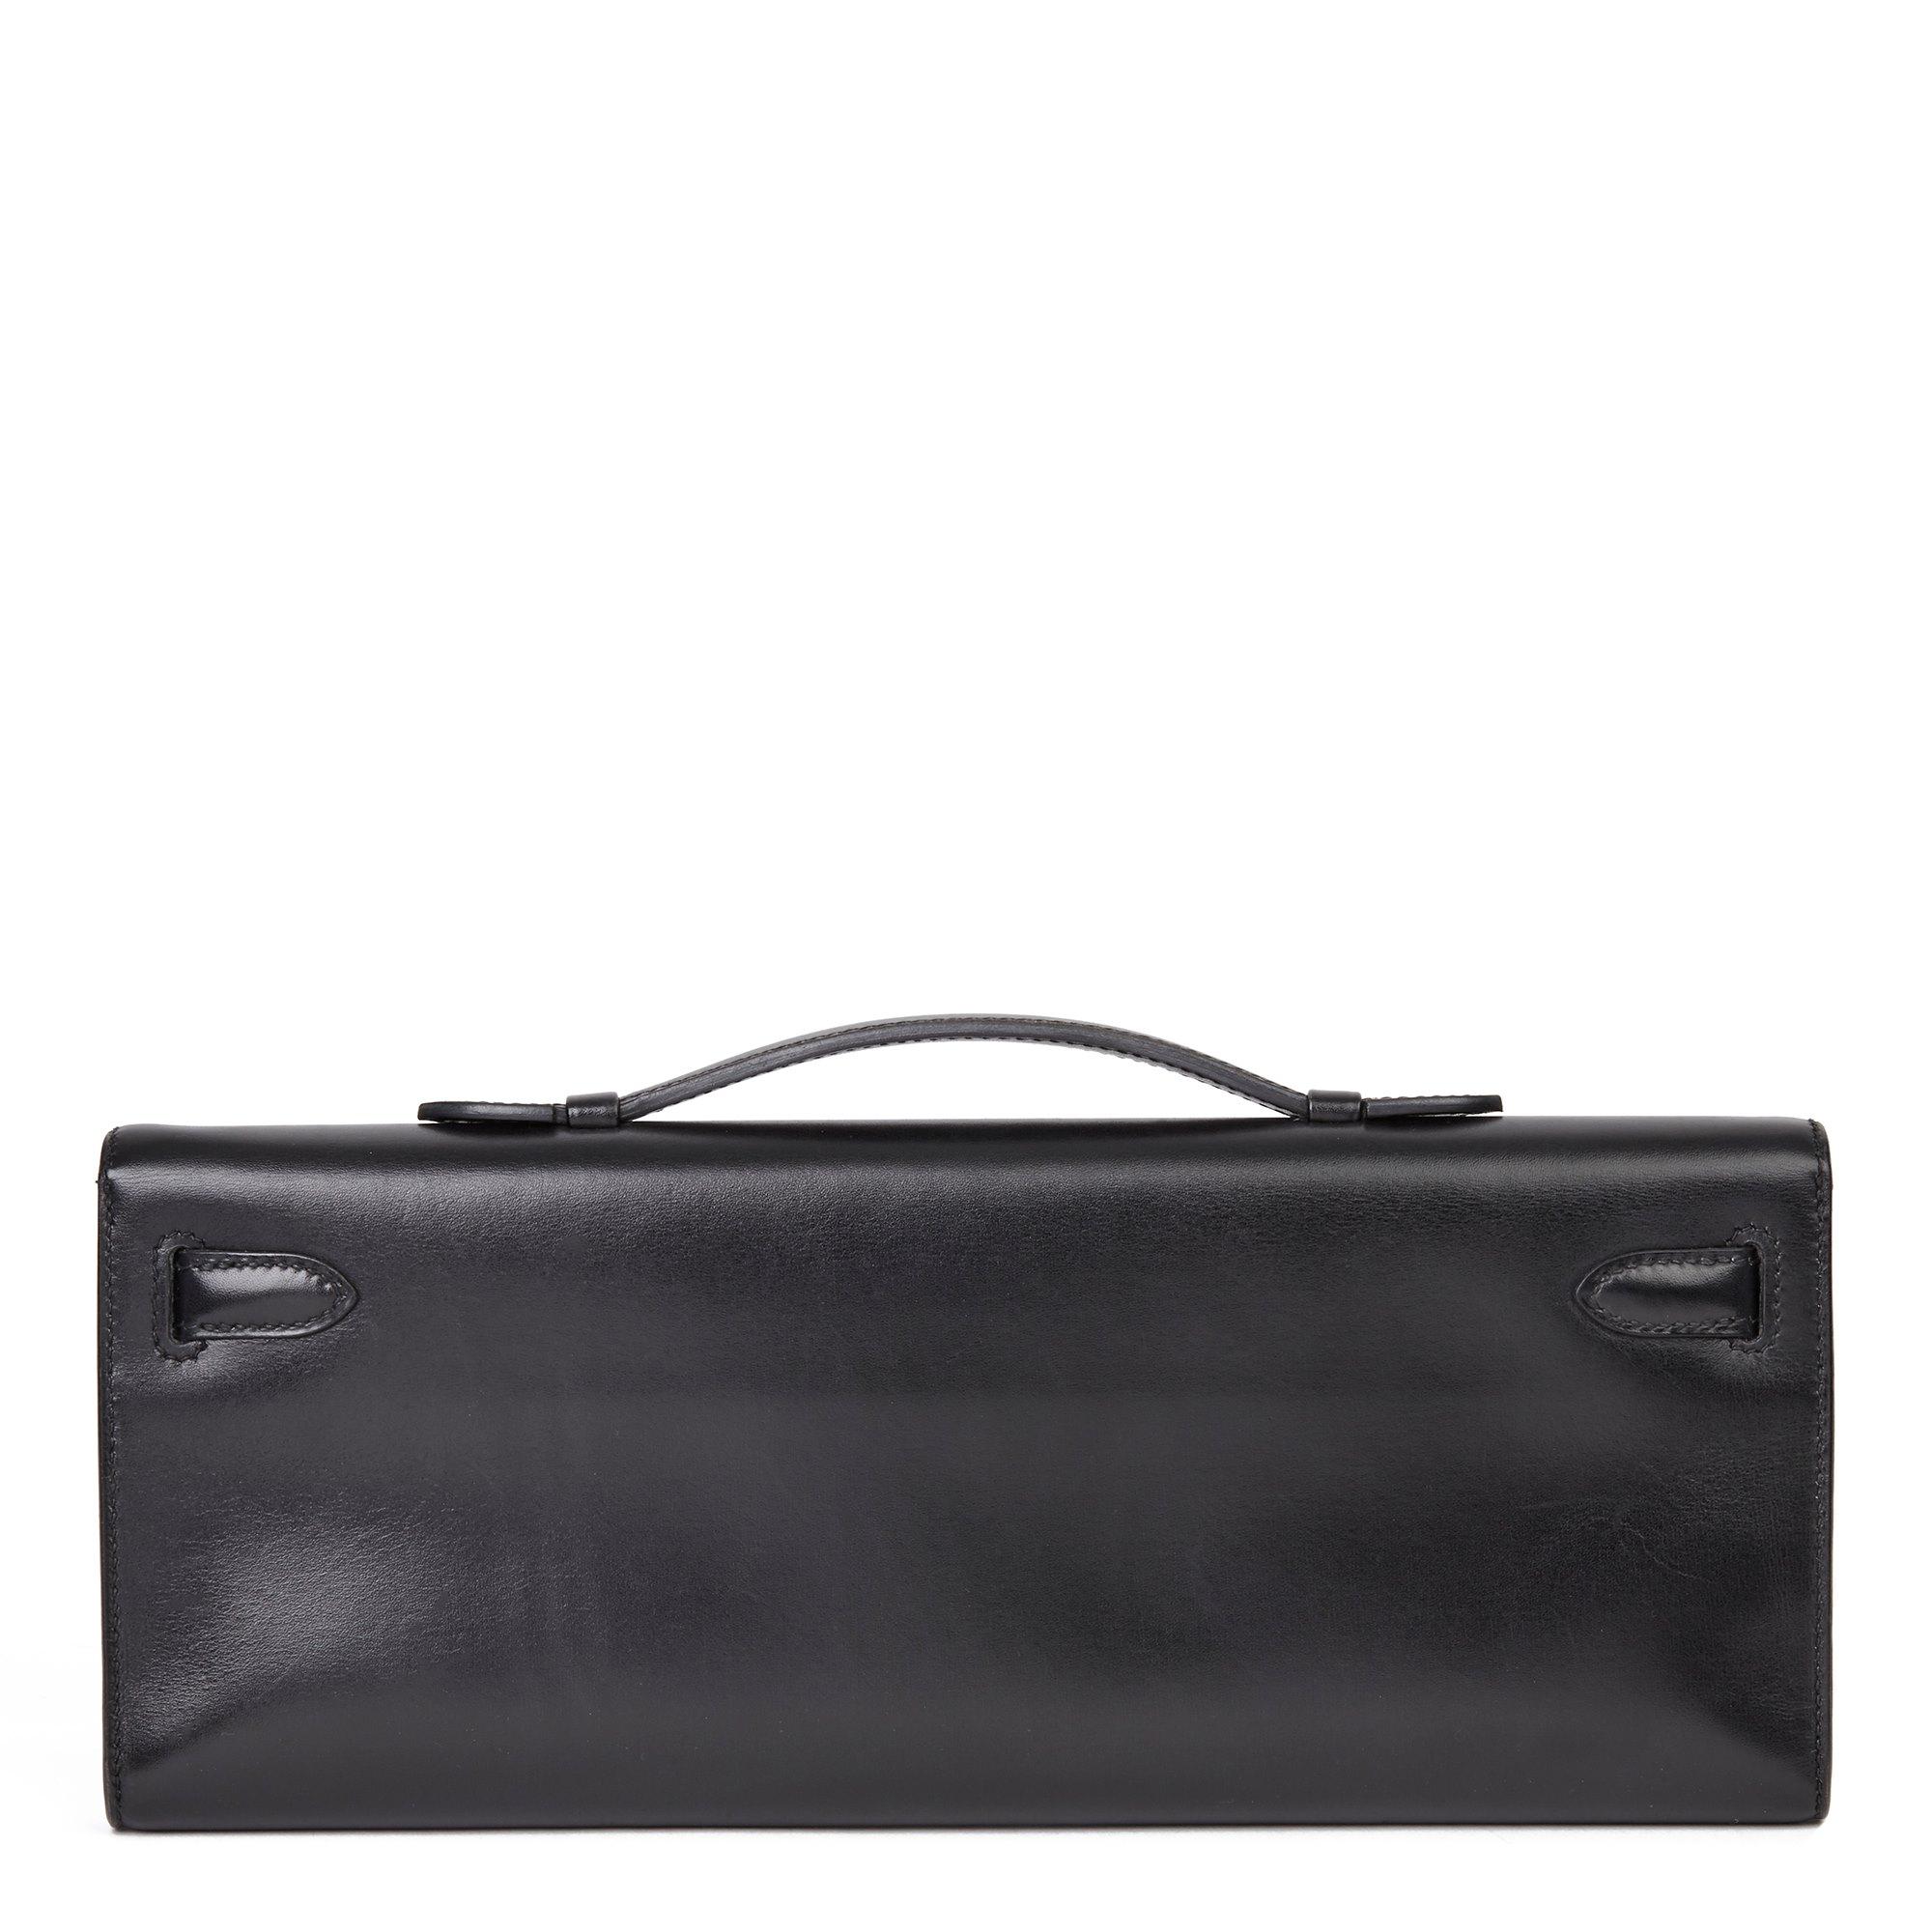 Hermès Black Box Calf Leather SO Black Kelly Cut